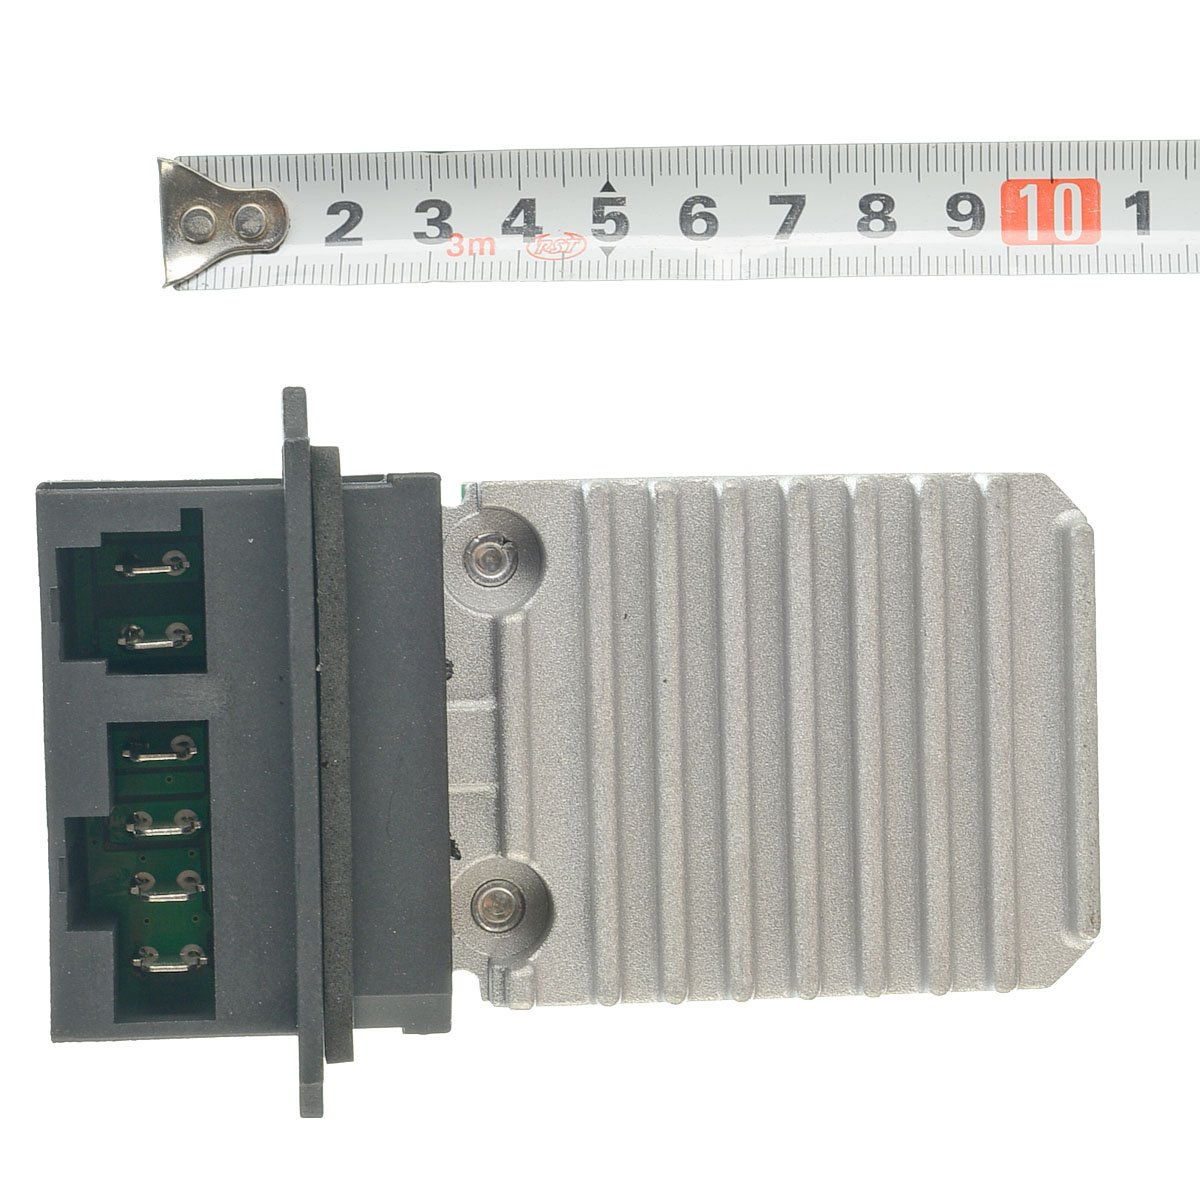 AC Heater Blower Motor Resistor for Chrysler 300M Concorde Intrepid LHS New/Yorker Dodge Intrepid Vision